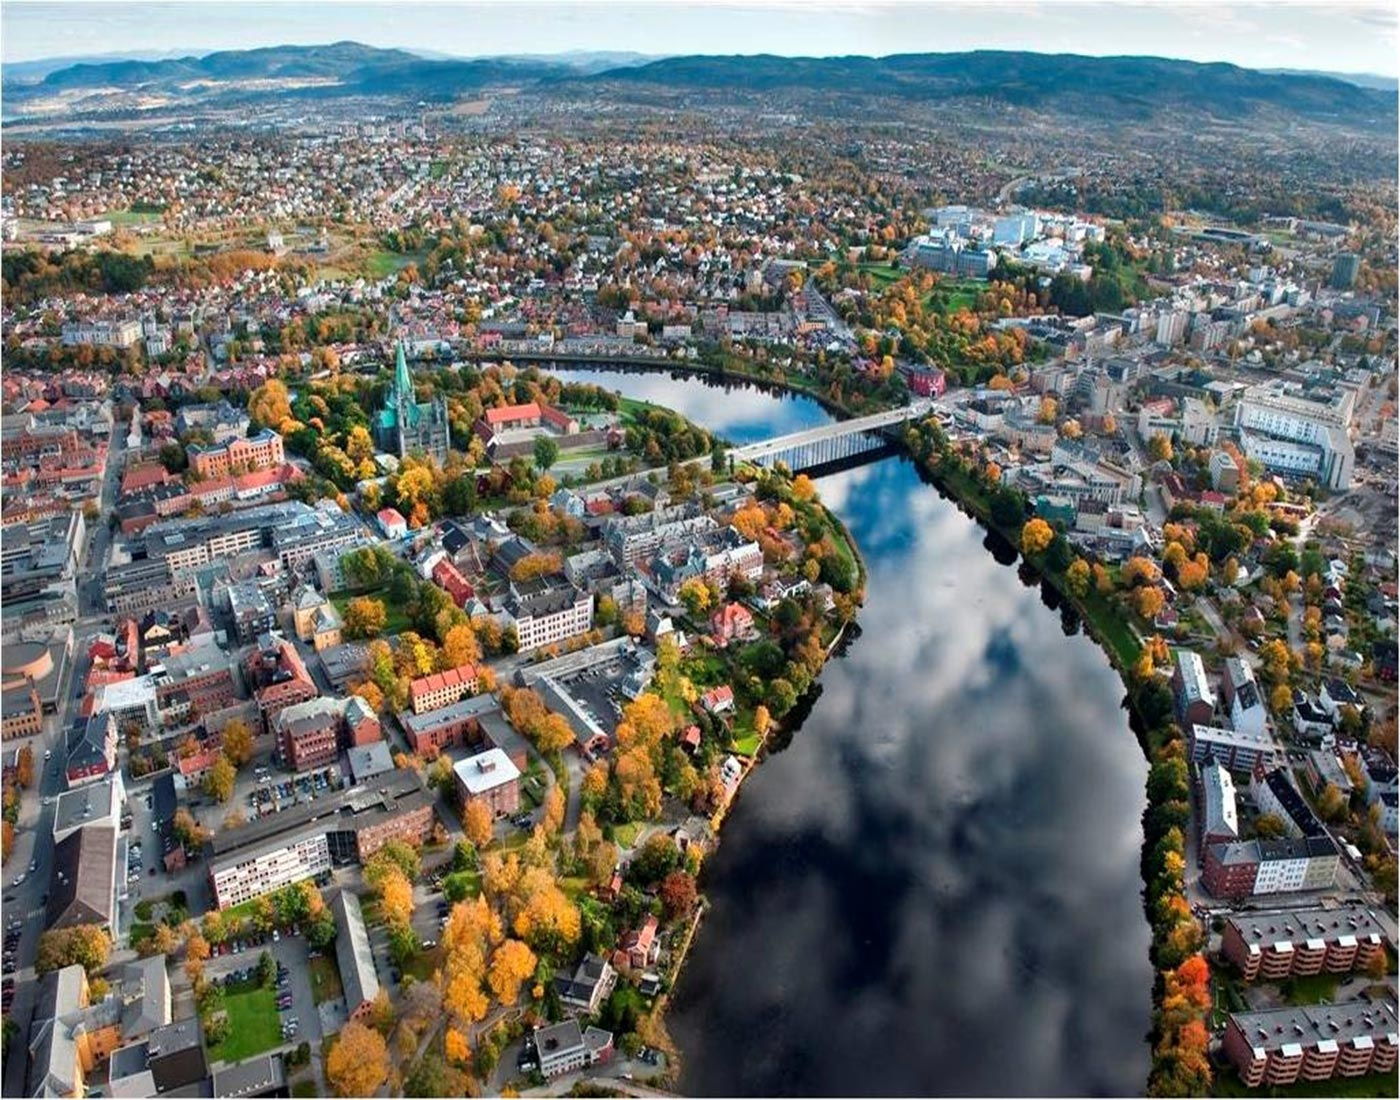 Avd.Trondheim